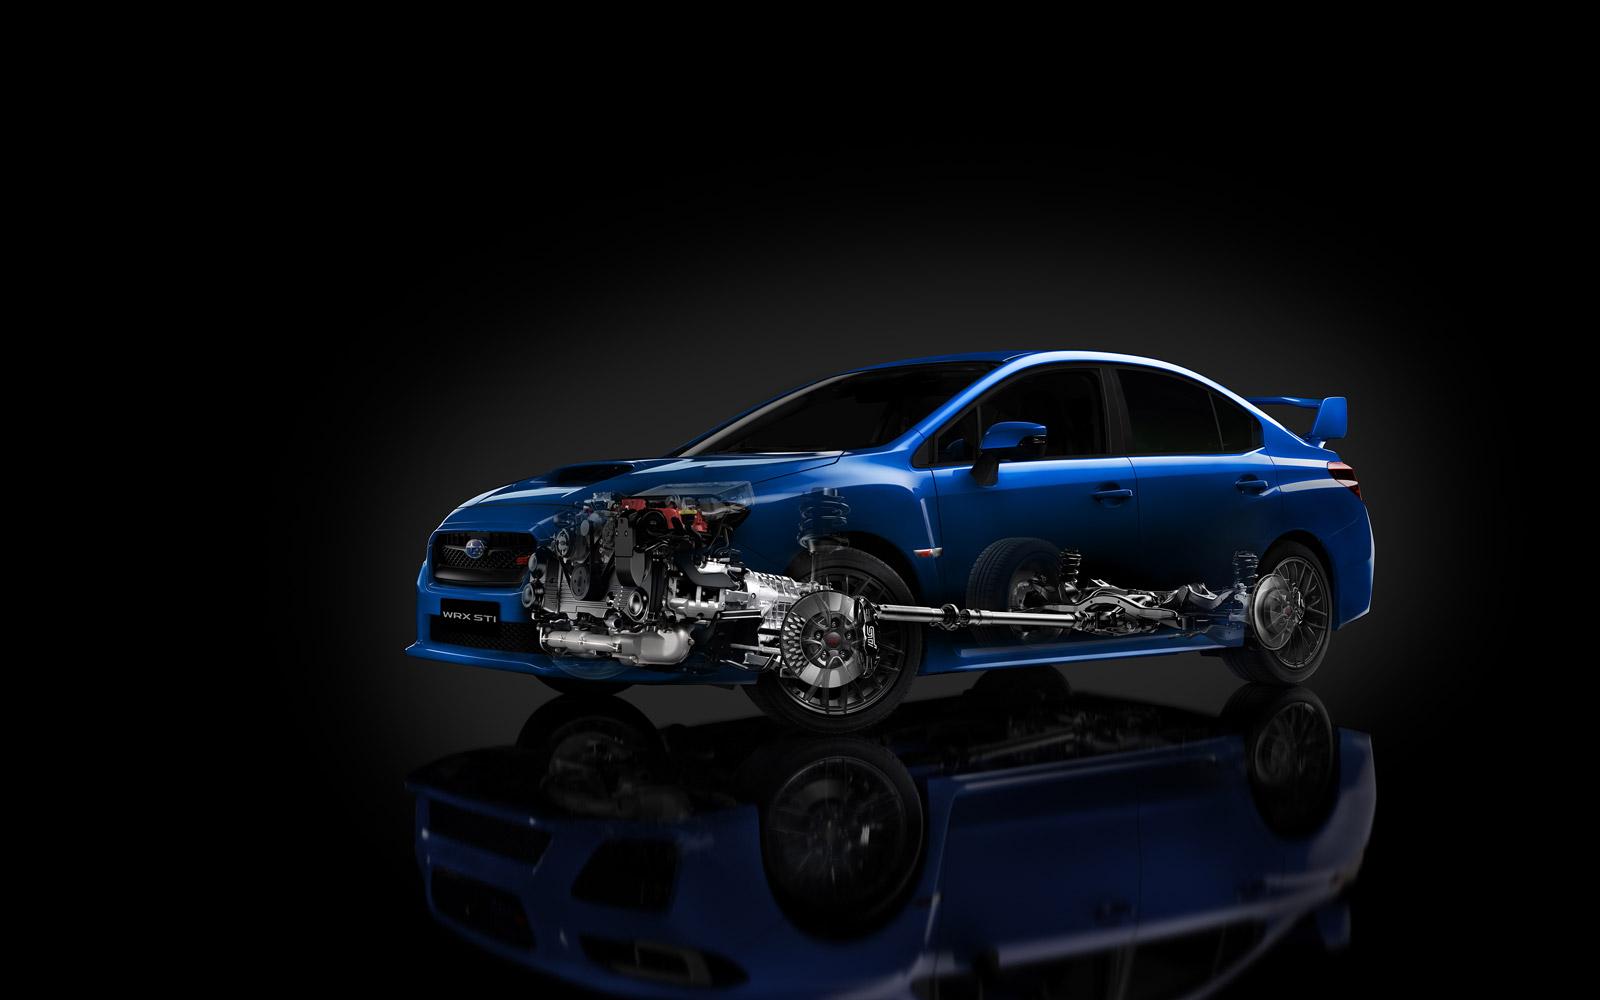 2015 Subaru WRX, STI Models Priced: WRX Gets Big Value Boost